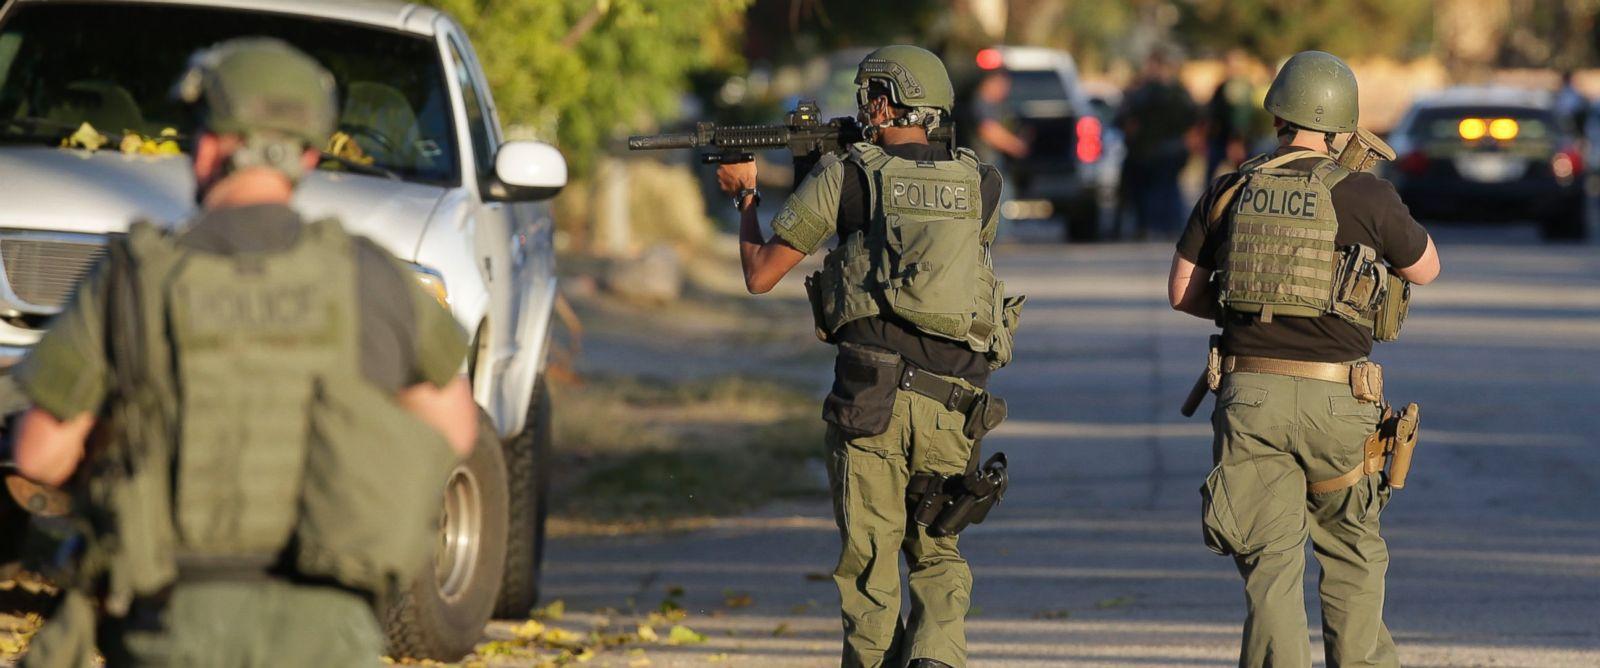 A swat team arrives at the scene of a shooting in San Bernardino, Calif., Dec. 2, 2015. [reuters]